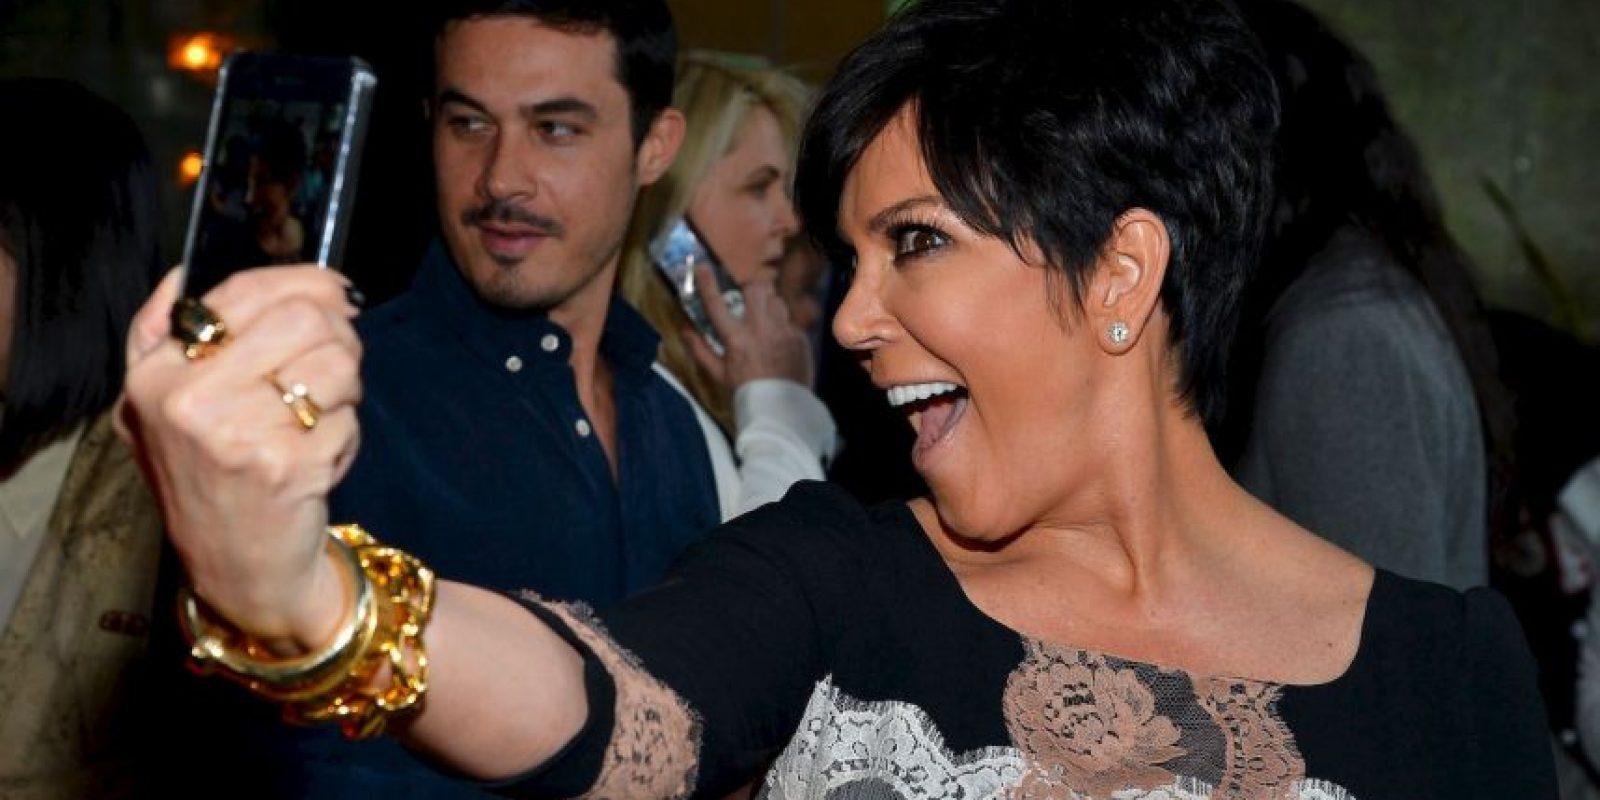 Pam Behan, exniñera de las Kardashian, ayudó a Kris Jenner a criar a sus hijos. Foto:Getty Images